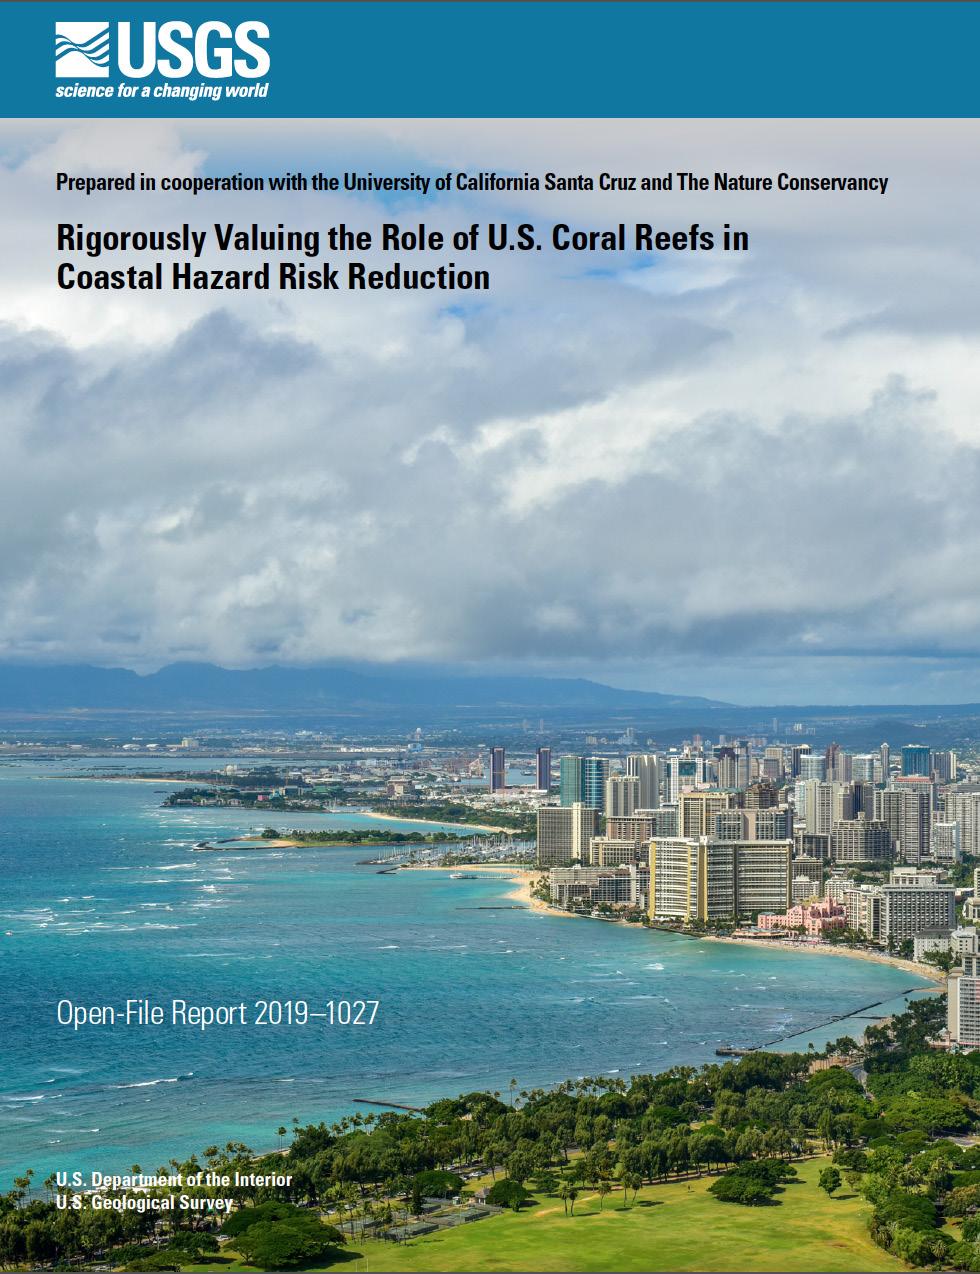 Urban Waikiki and the surrounding coral reefs. -